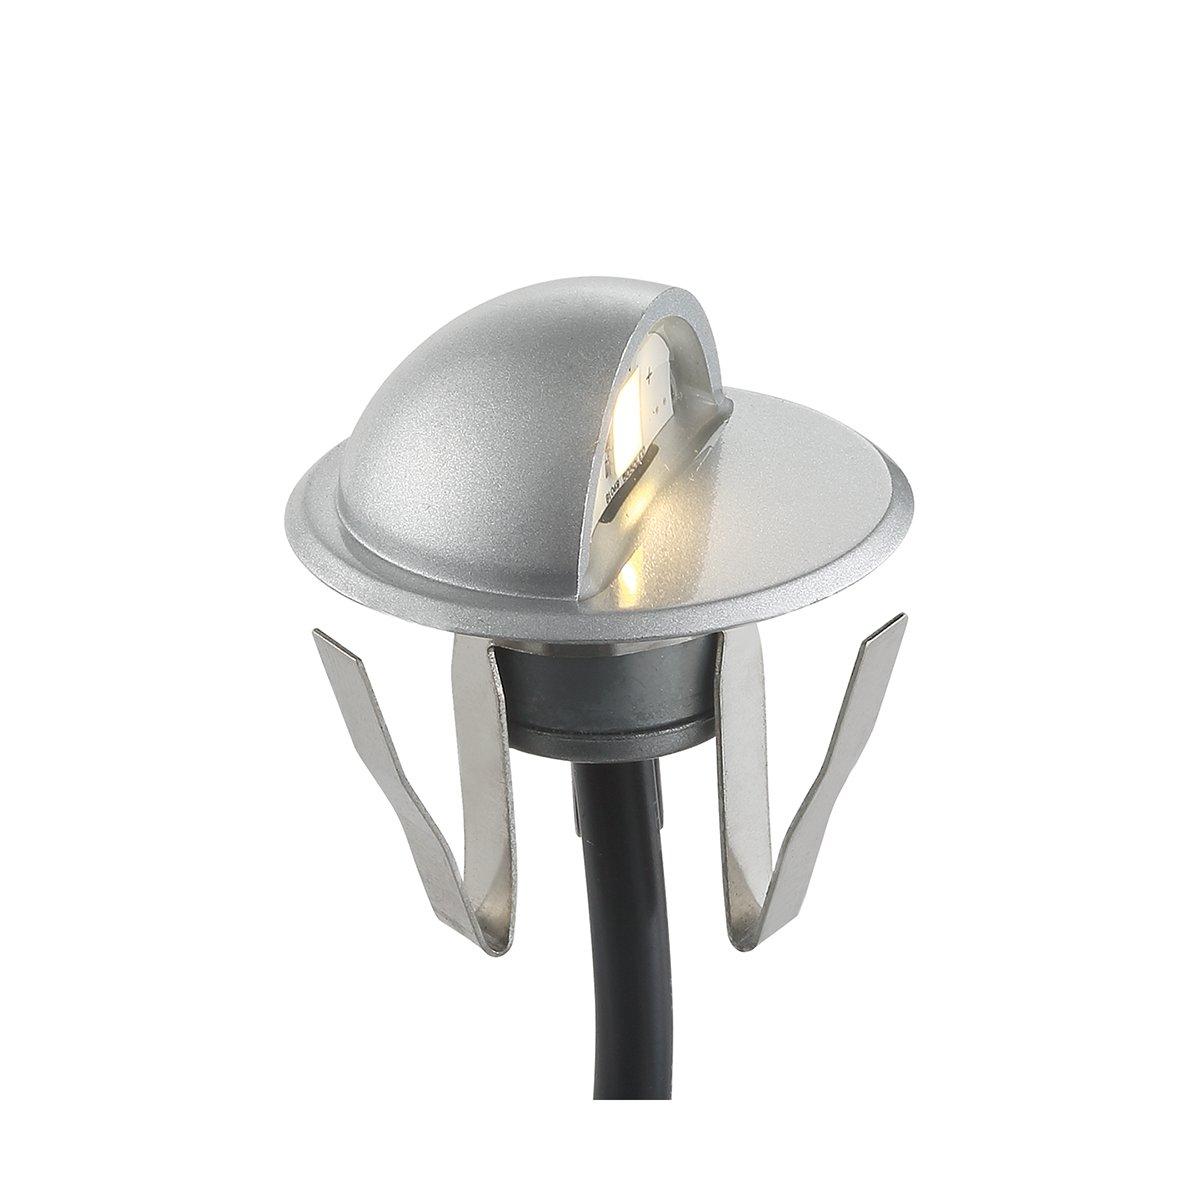 Eurofase 32095-012 Deck Light Outdoor Kit Directional LED, Stainless Steel